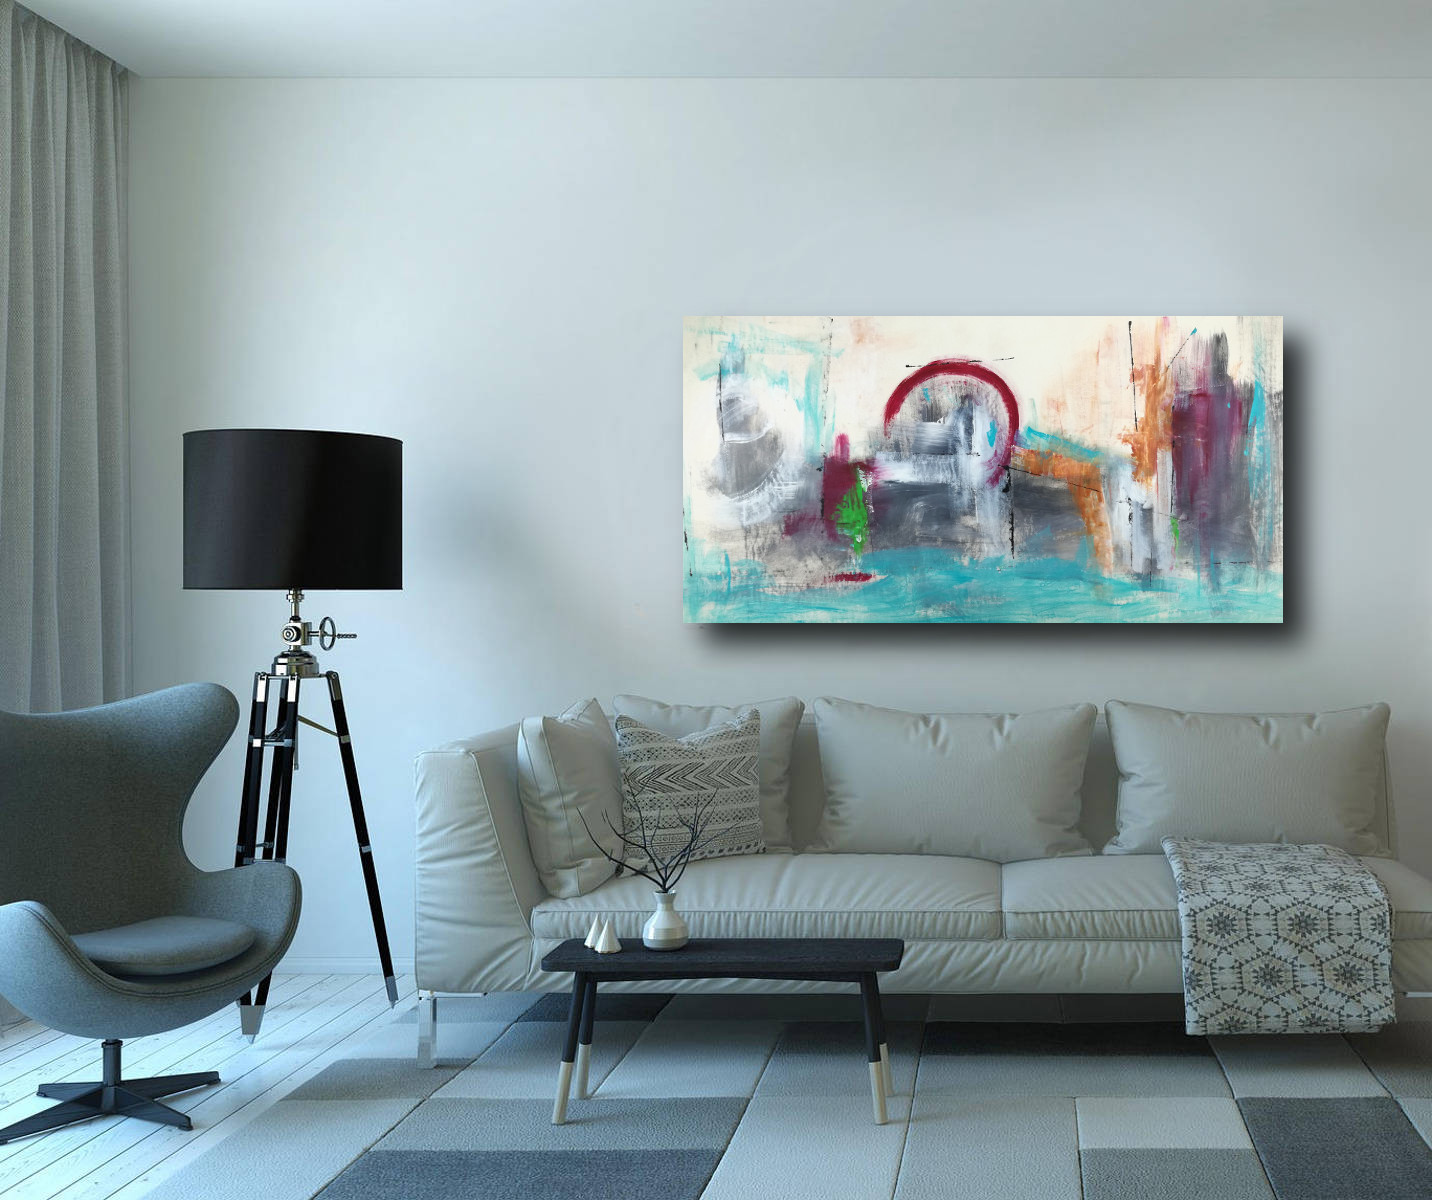 Emejing quadri per soggiorni moderni photos house for Quadri per soggiorni moderni